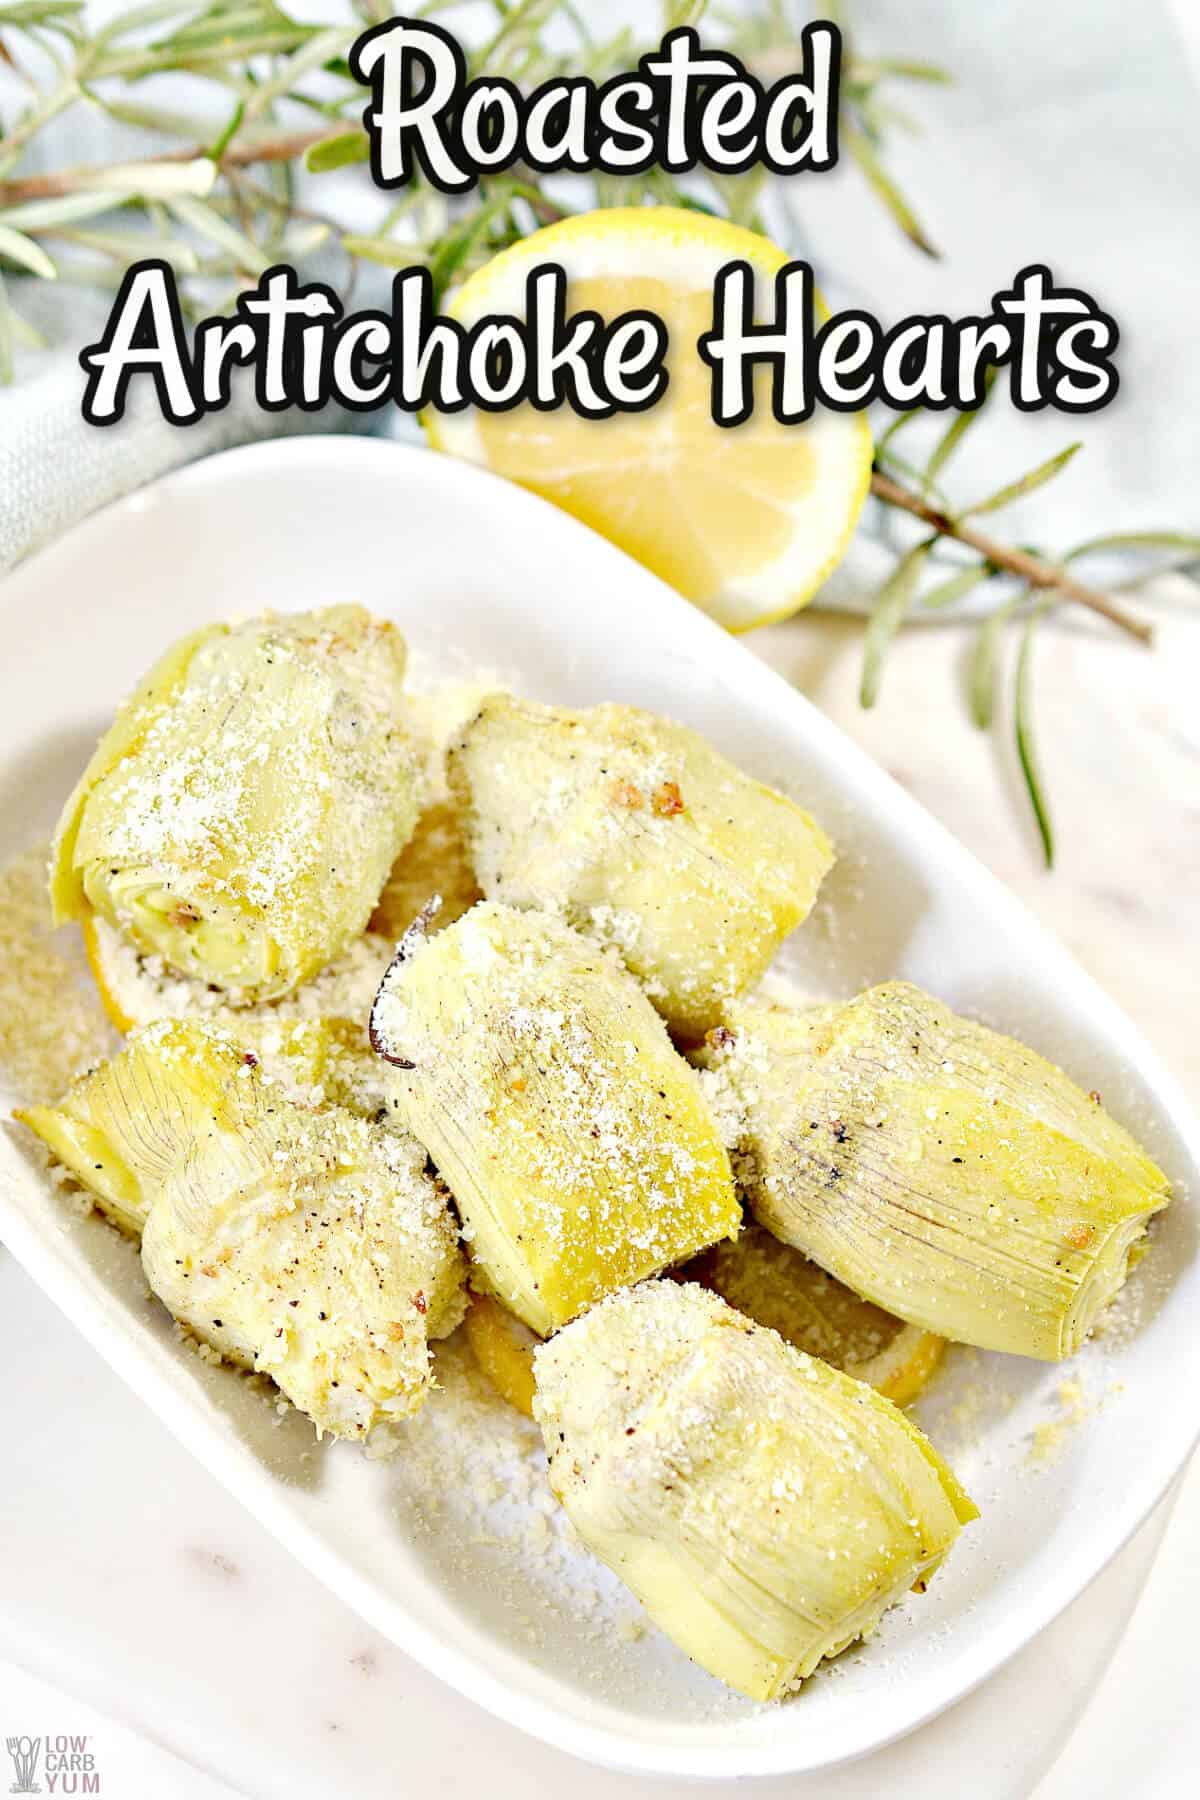 roasted artichoke hearts recipe cover image